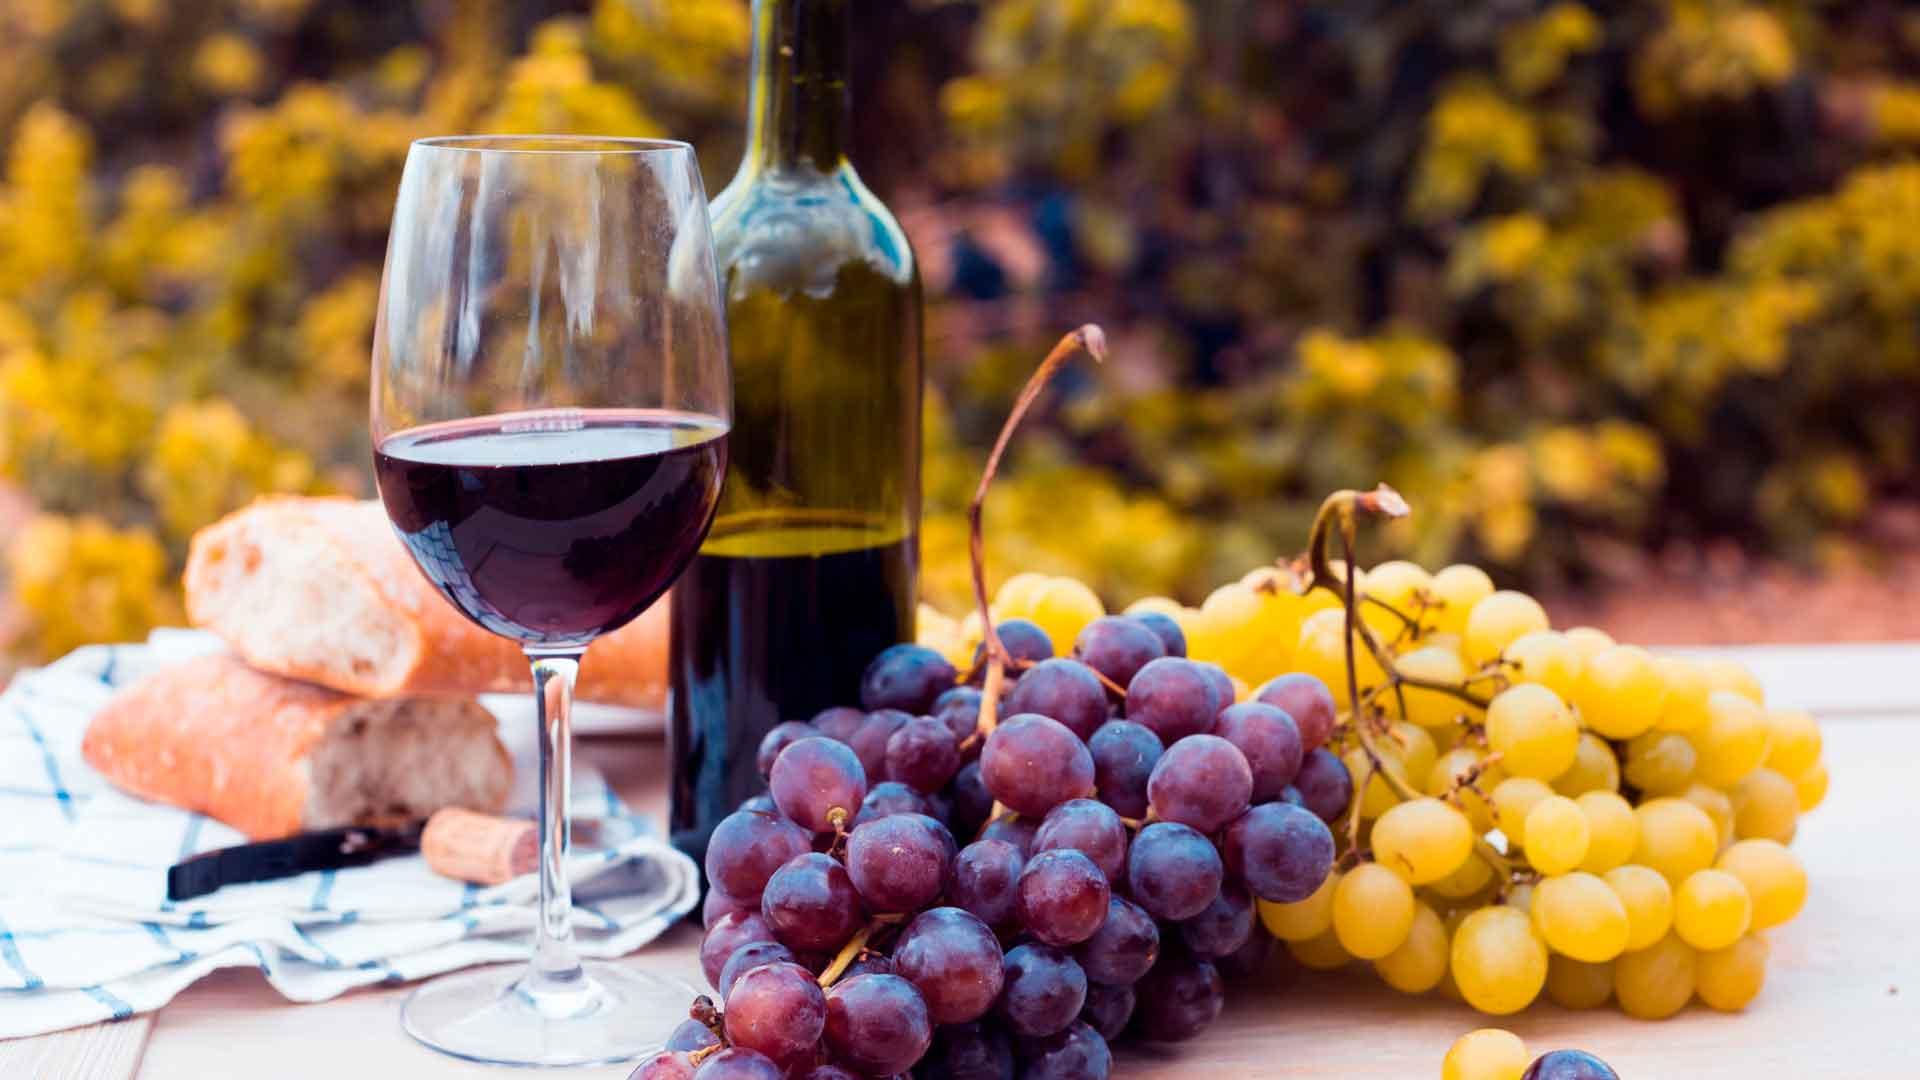 4 vinos argentinos imperdibles para brindar